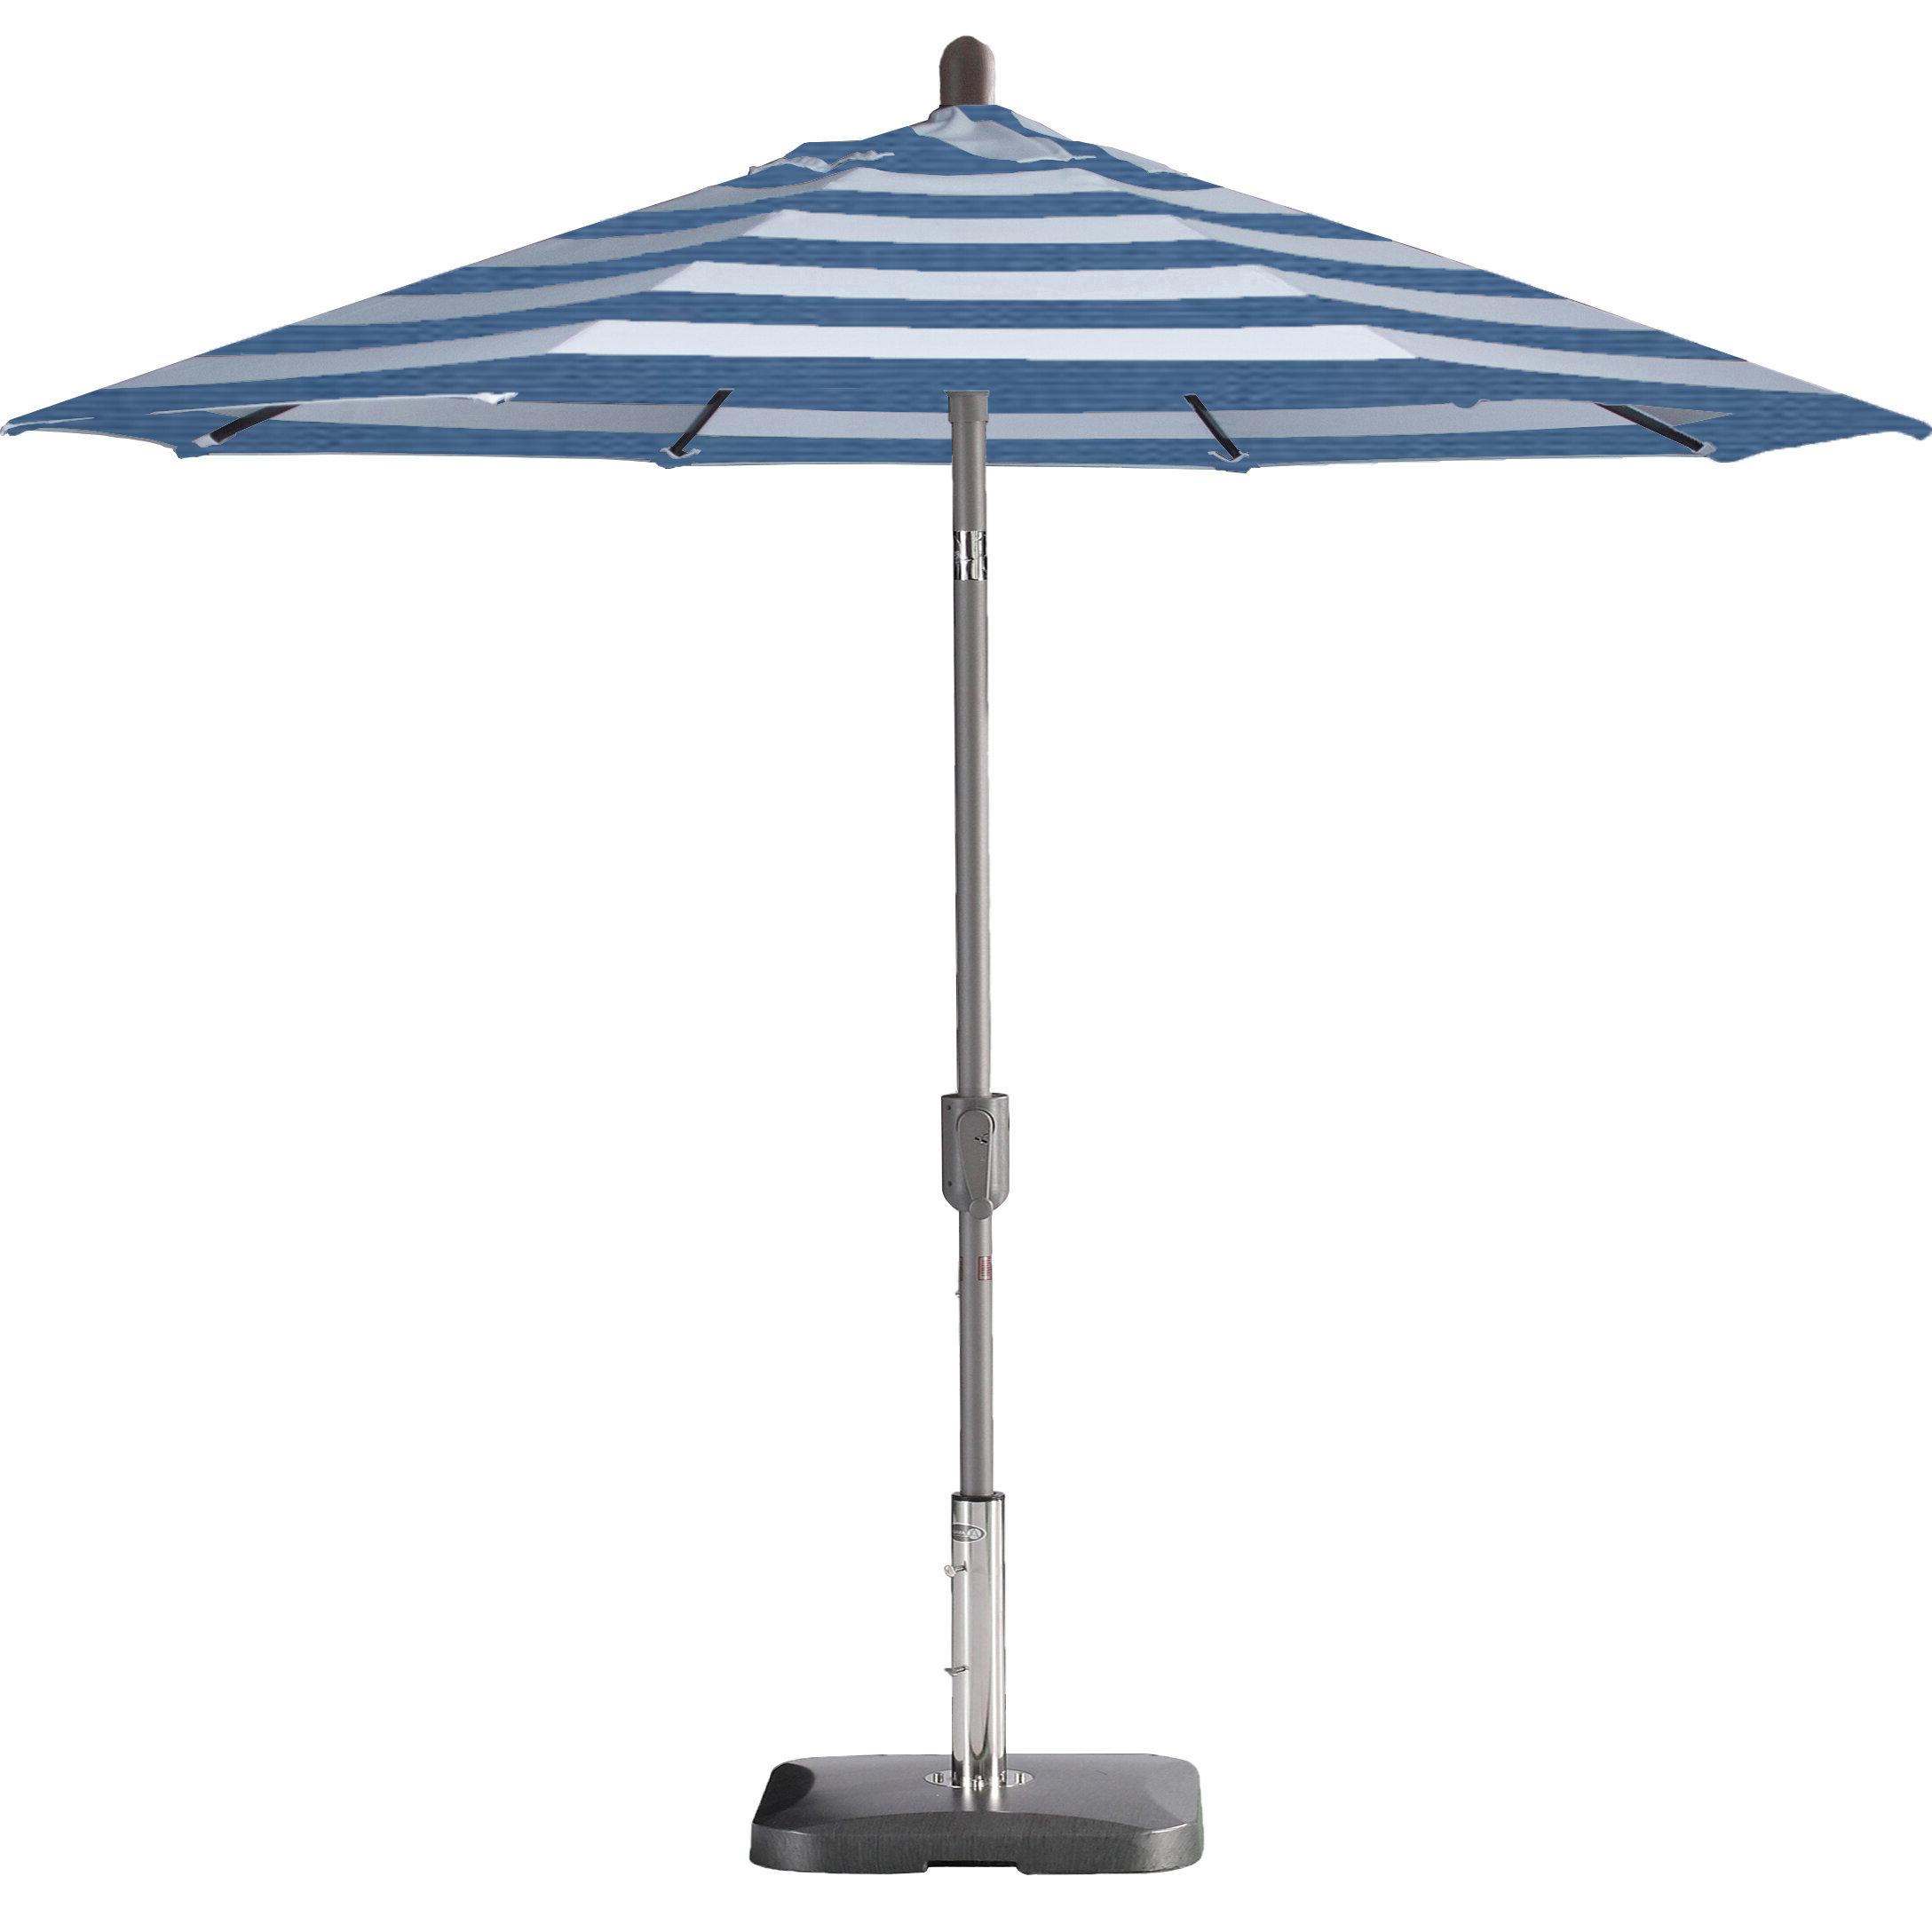 Featured Photo of Wiechmann Market Sunbrella Umbrellas